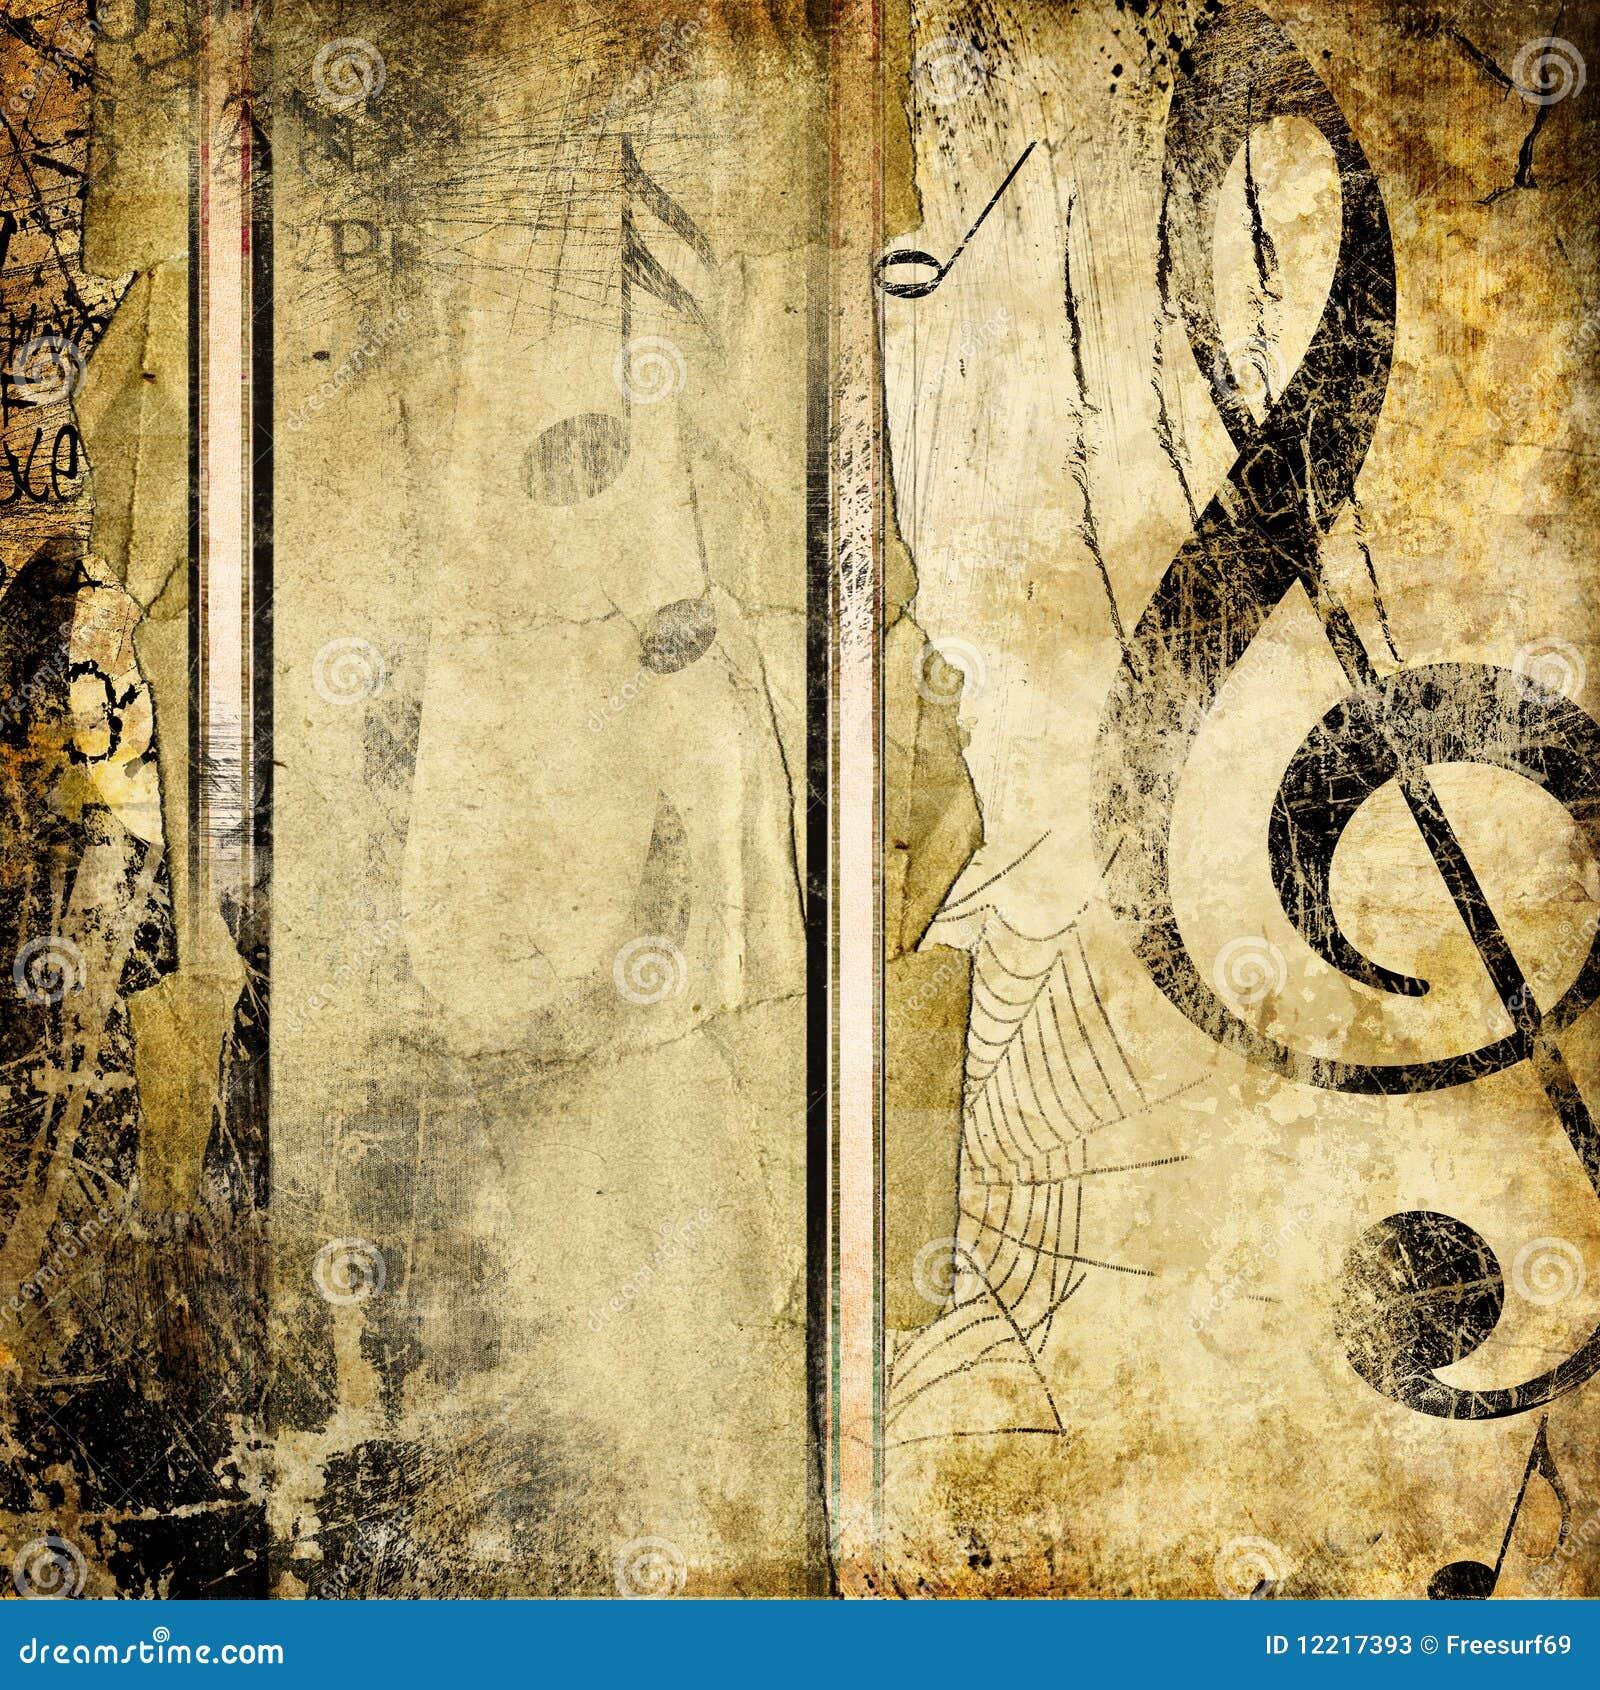 vintage music photos jpg 1152x768